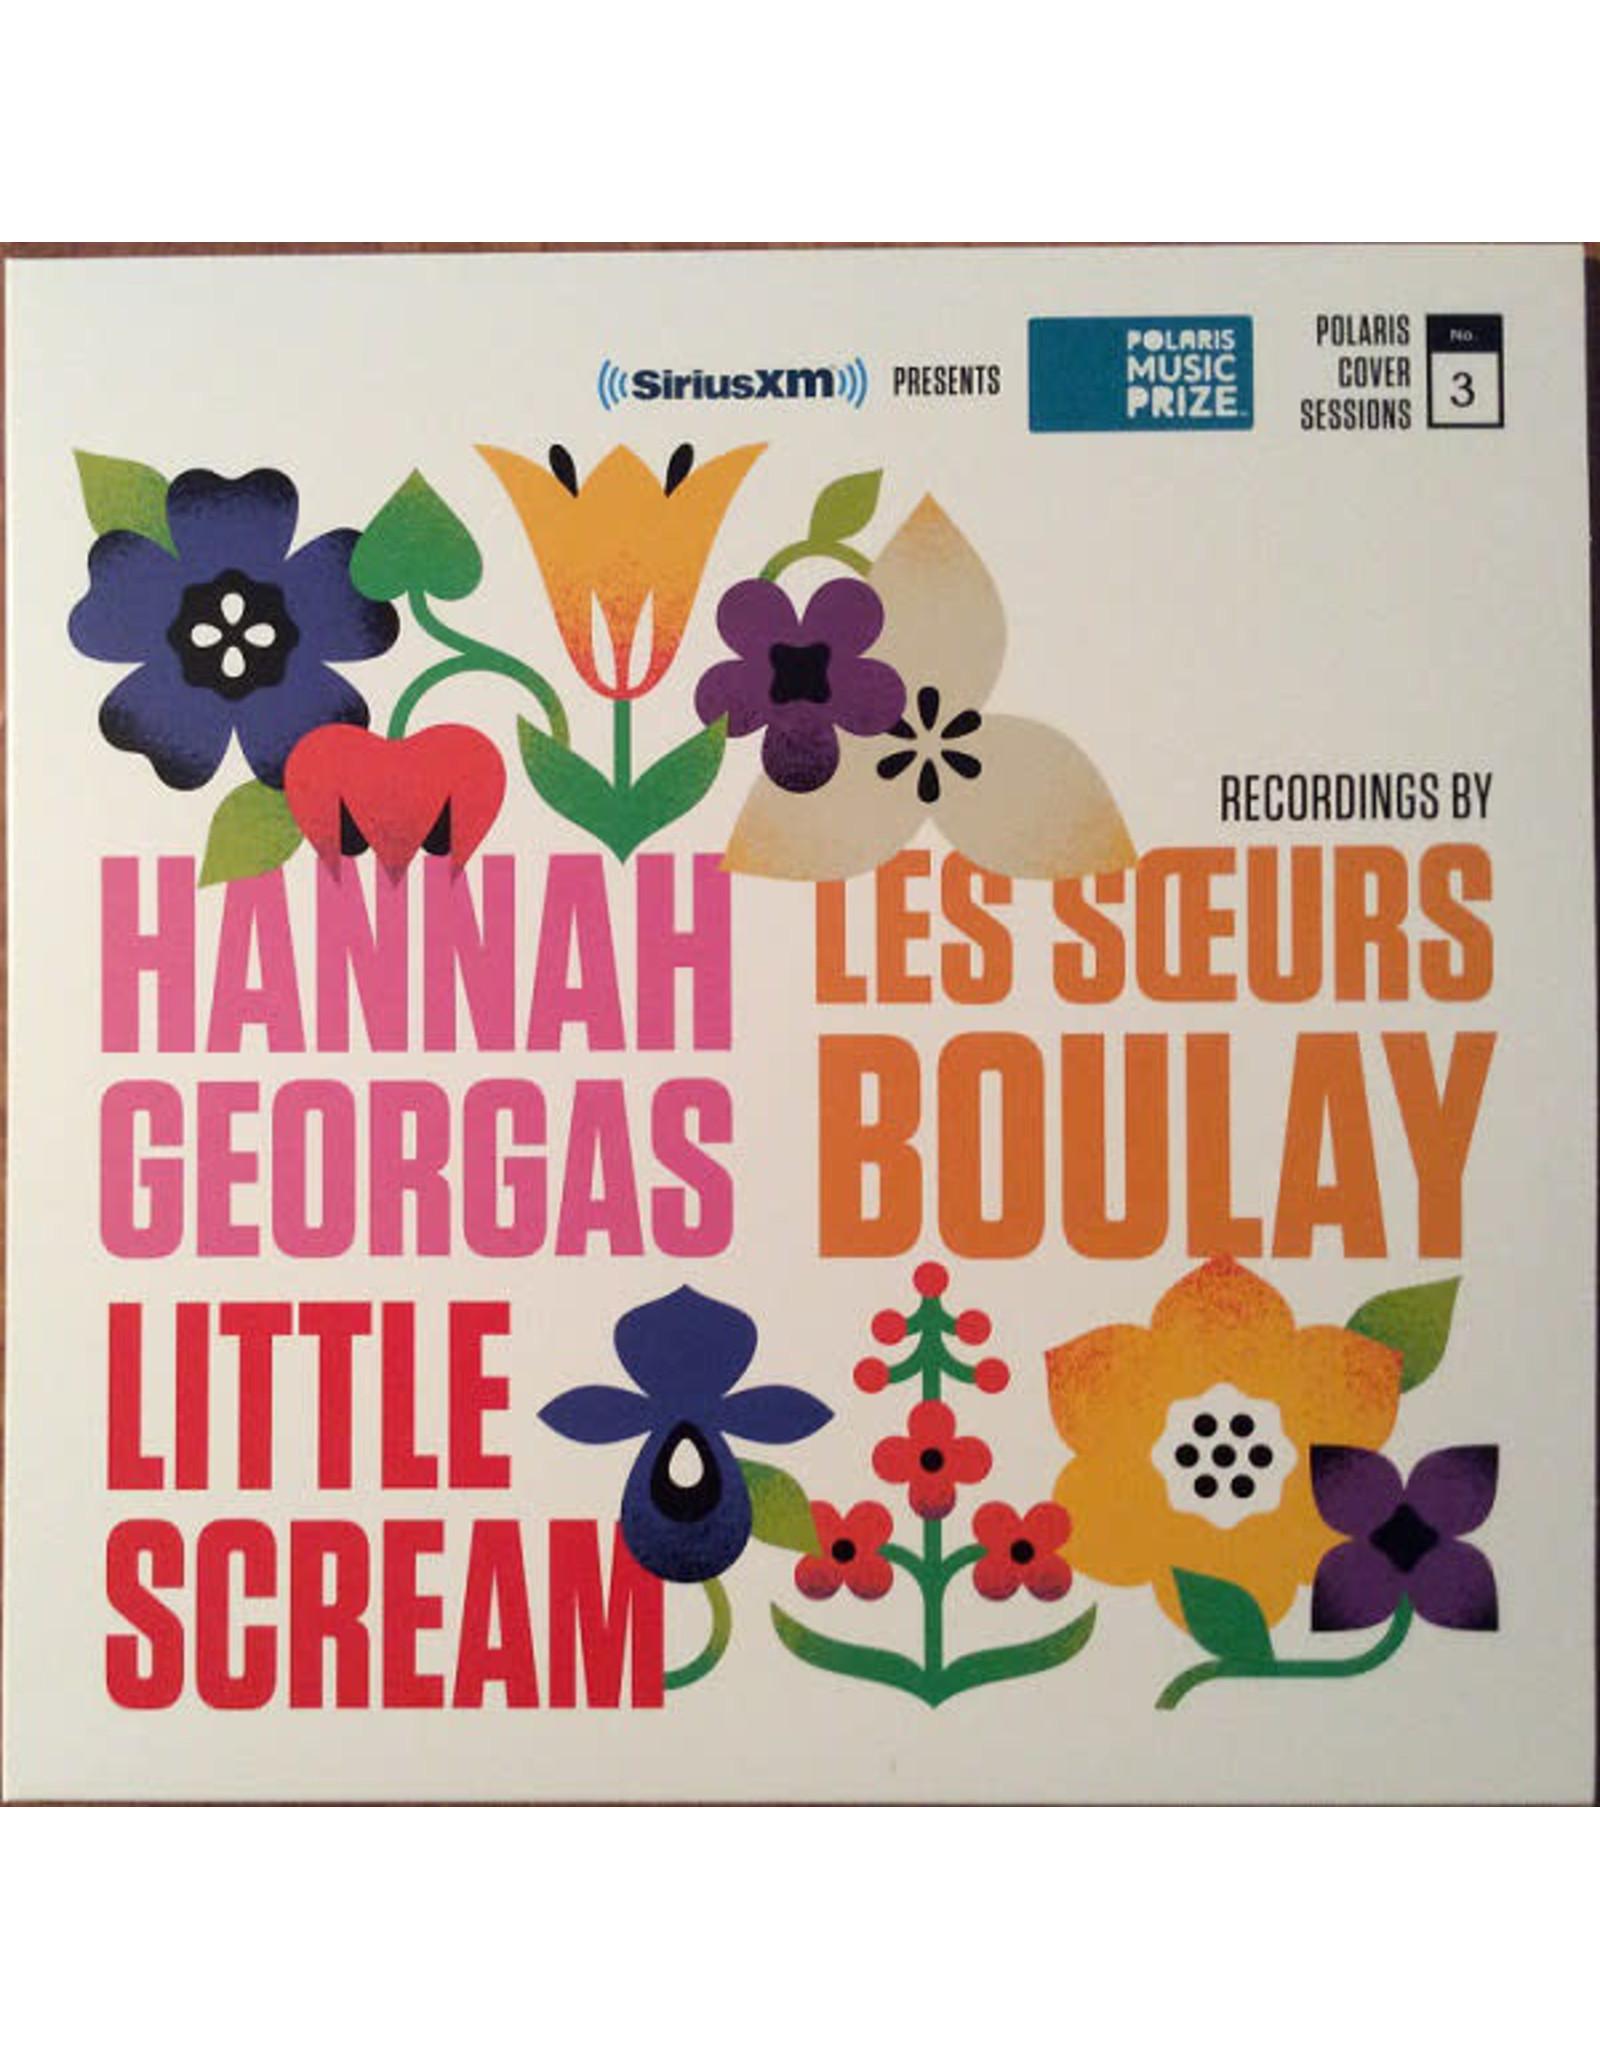 V/A - Polaris Cover Sessions No. 3 (Hannah Georges, Les Soeurs Boulay, Little Scream) LP